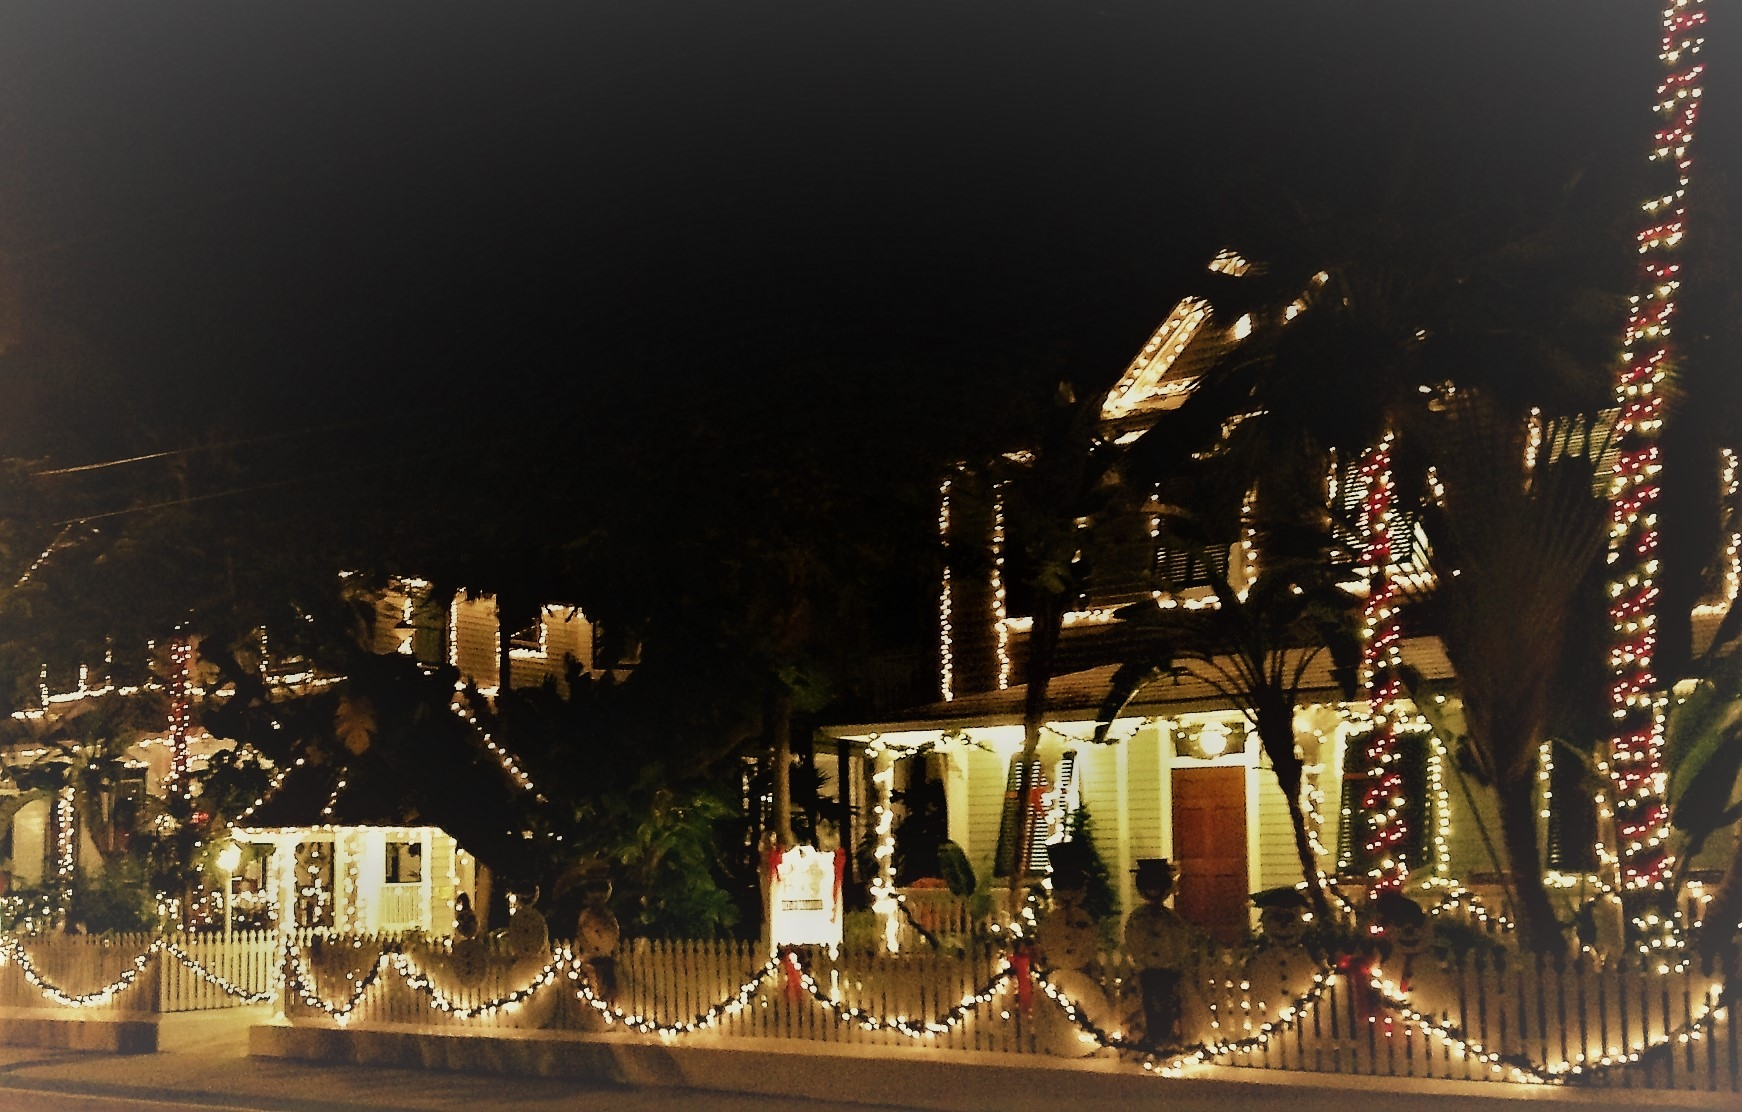 Bright lights, Key West version. Photo credit: M. Ciavardini